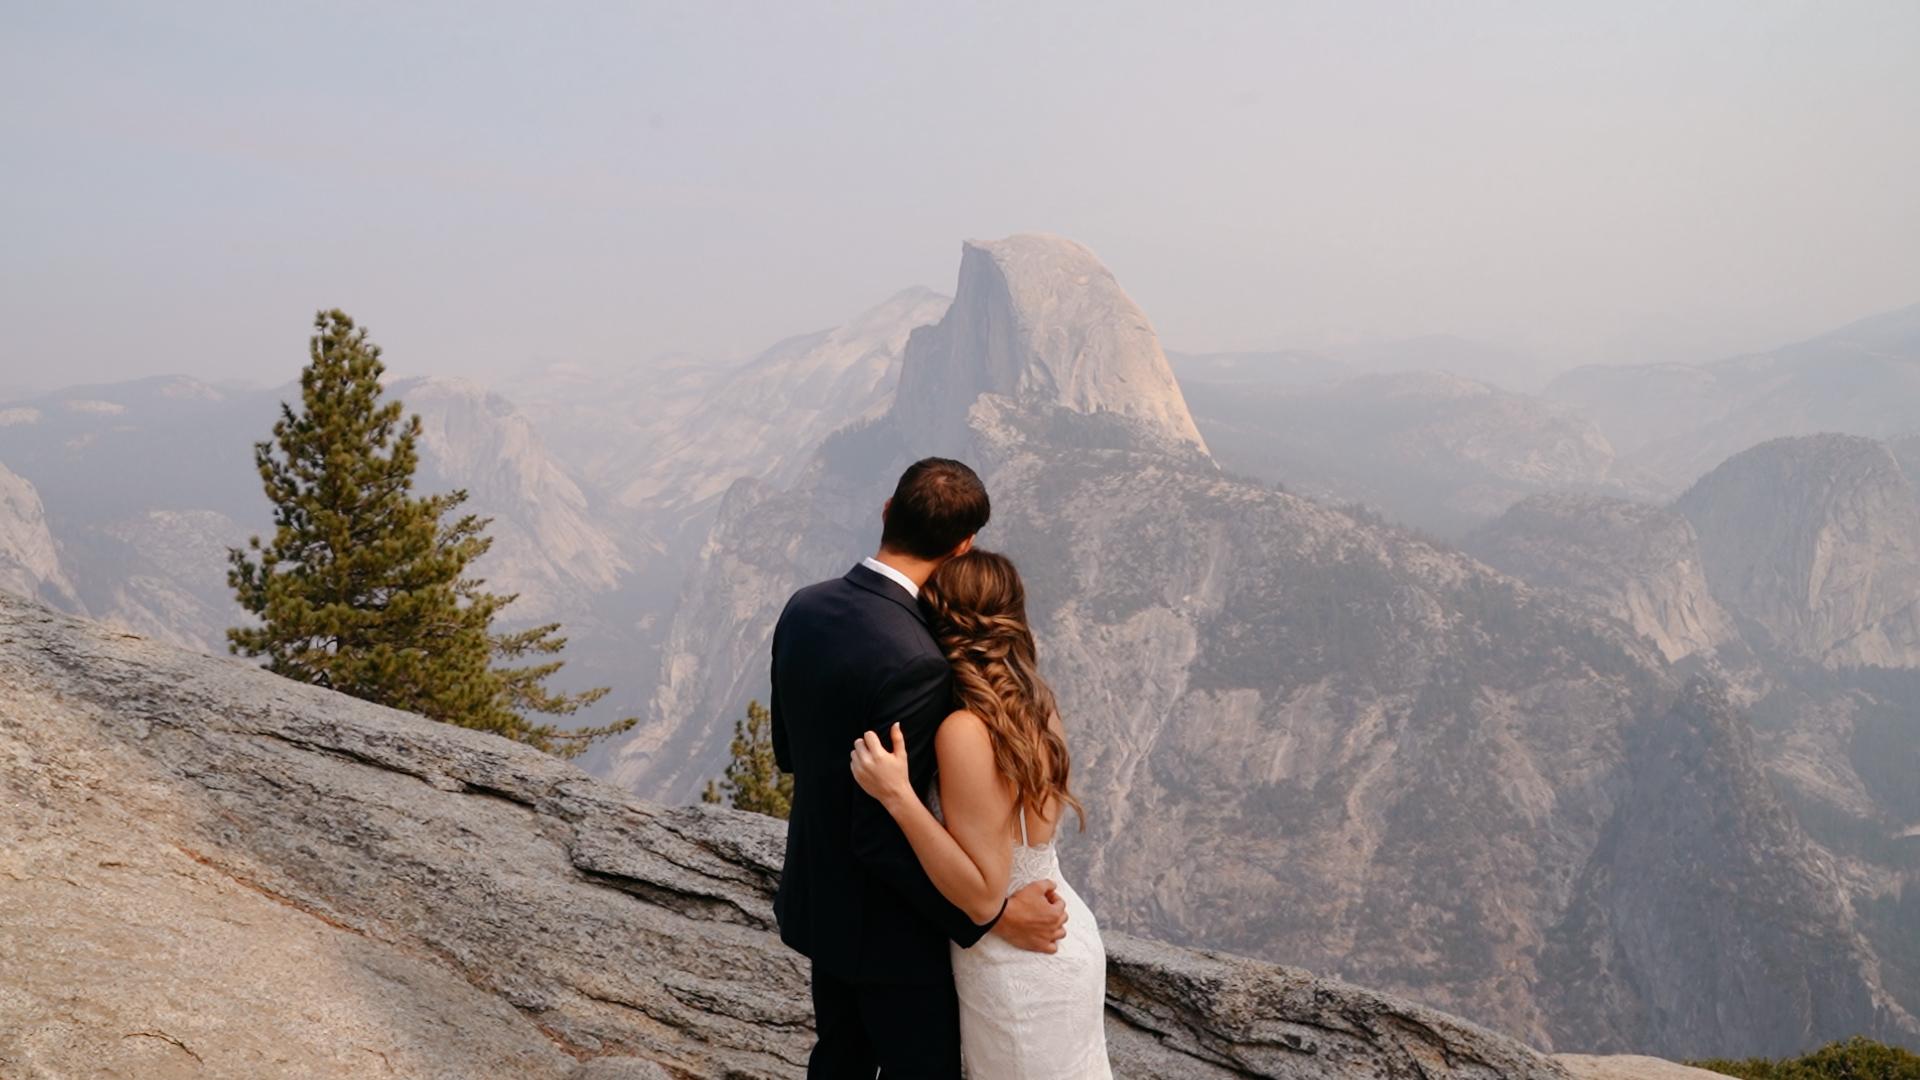 Dallas + Madison | Yosemite Valley, California | Yosemite National Park